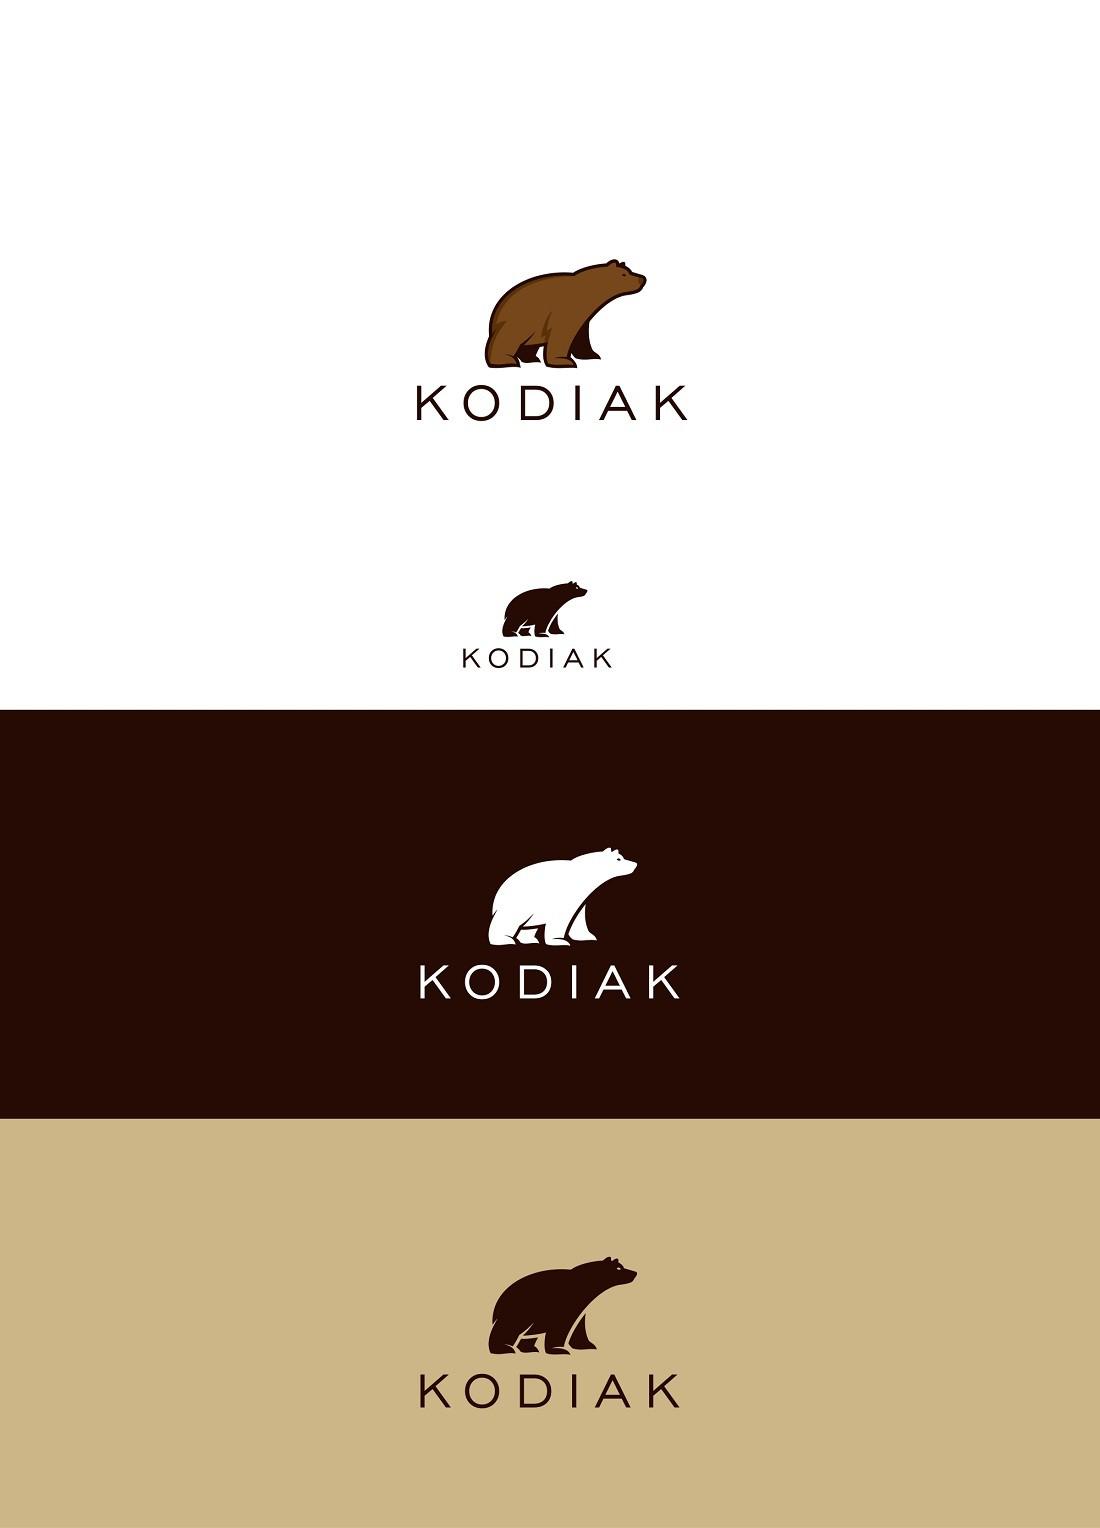 Create a great new logo for a new web company Kodiak